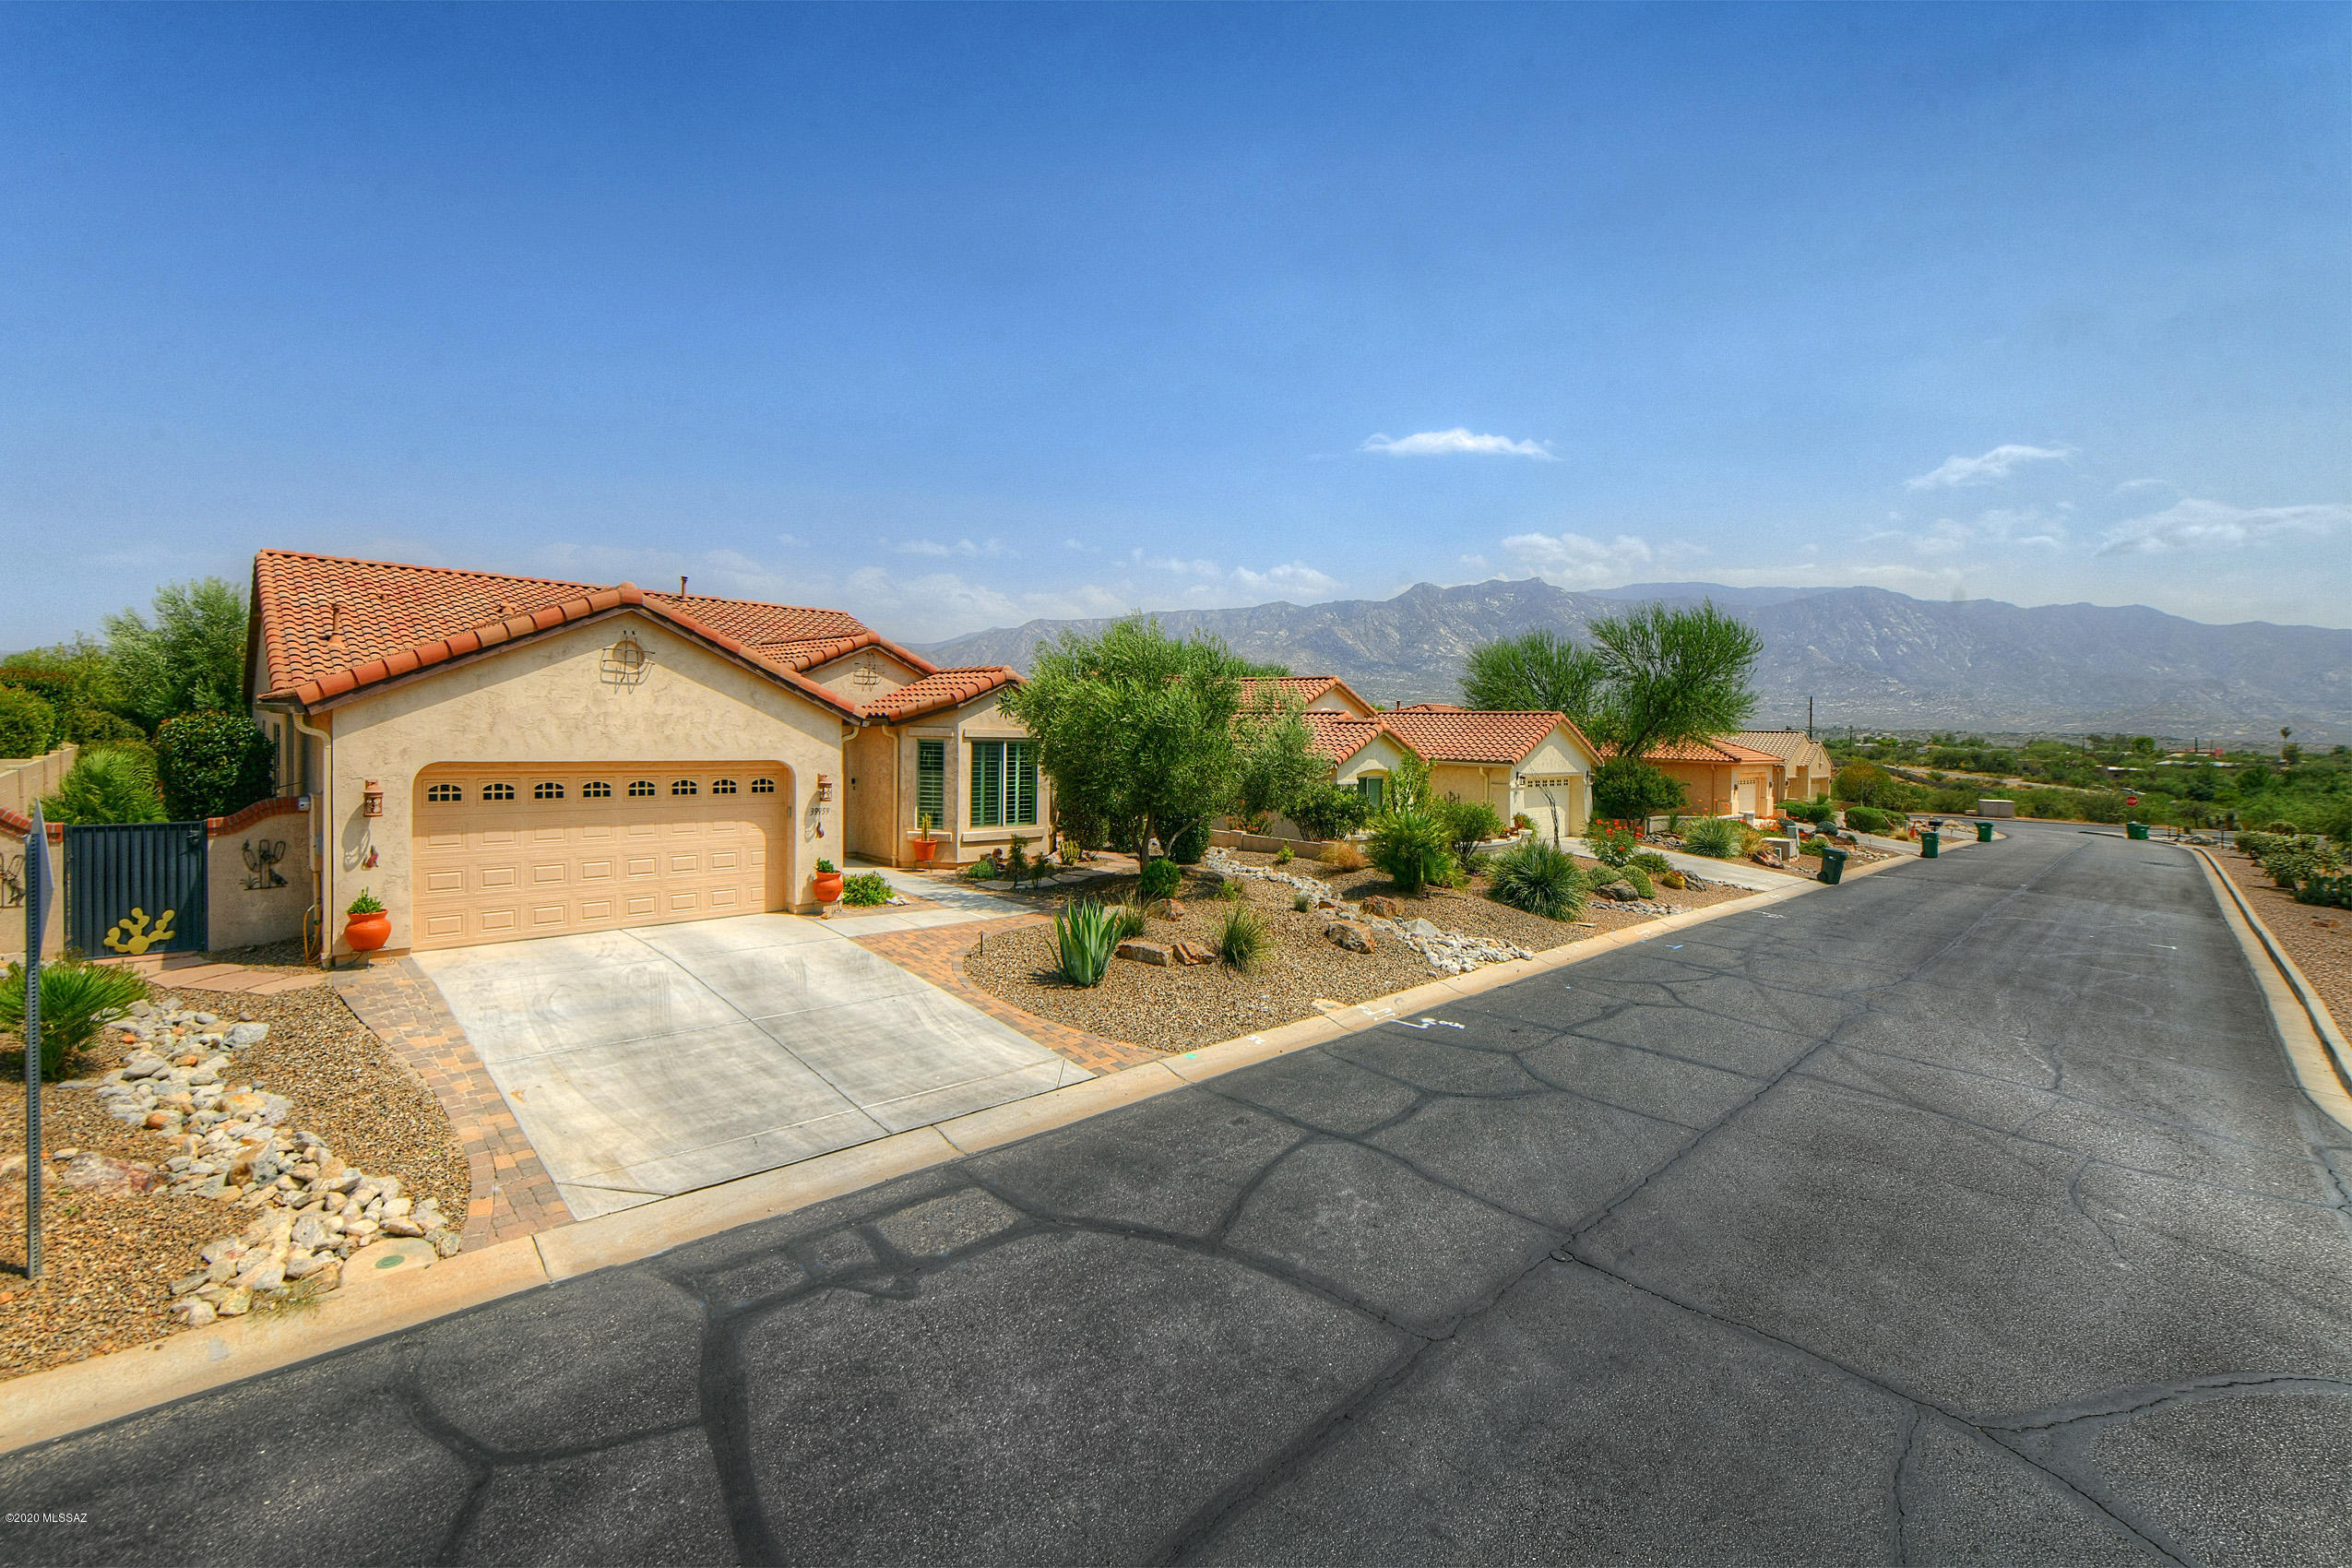 Photo of 39959 S Sand Crest Drive, Tucson, AZ 85739